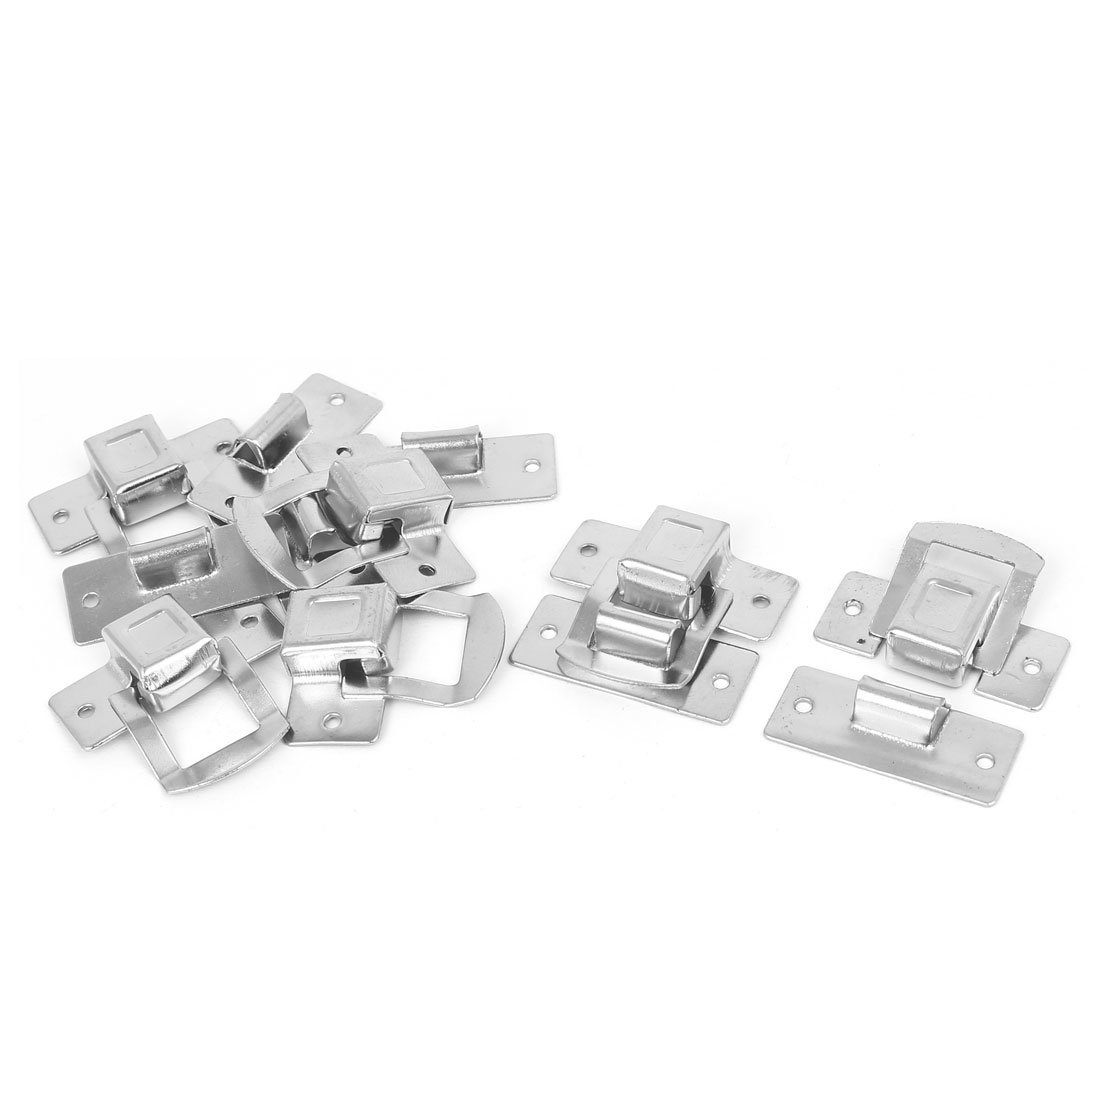 Toolbox Wooden Case Box Iron Toggle Latch Hasp Silver Tone 34mmx30mmx8mm 6pcs